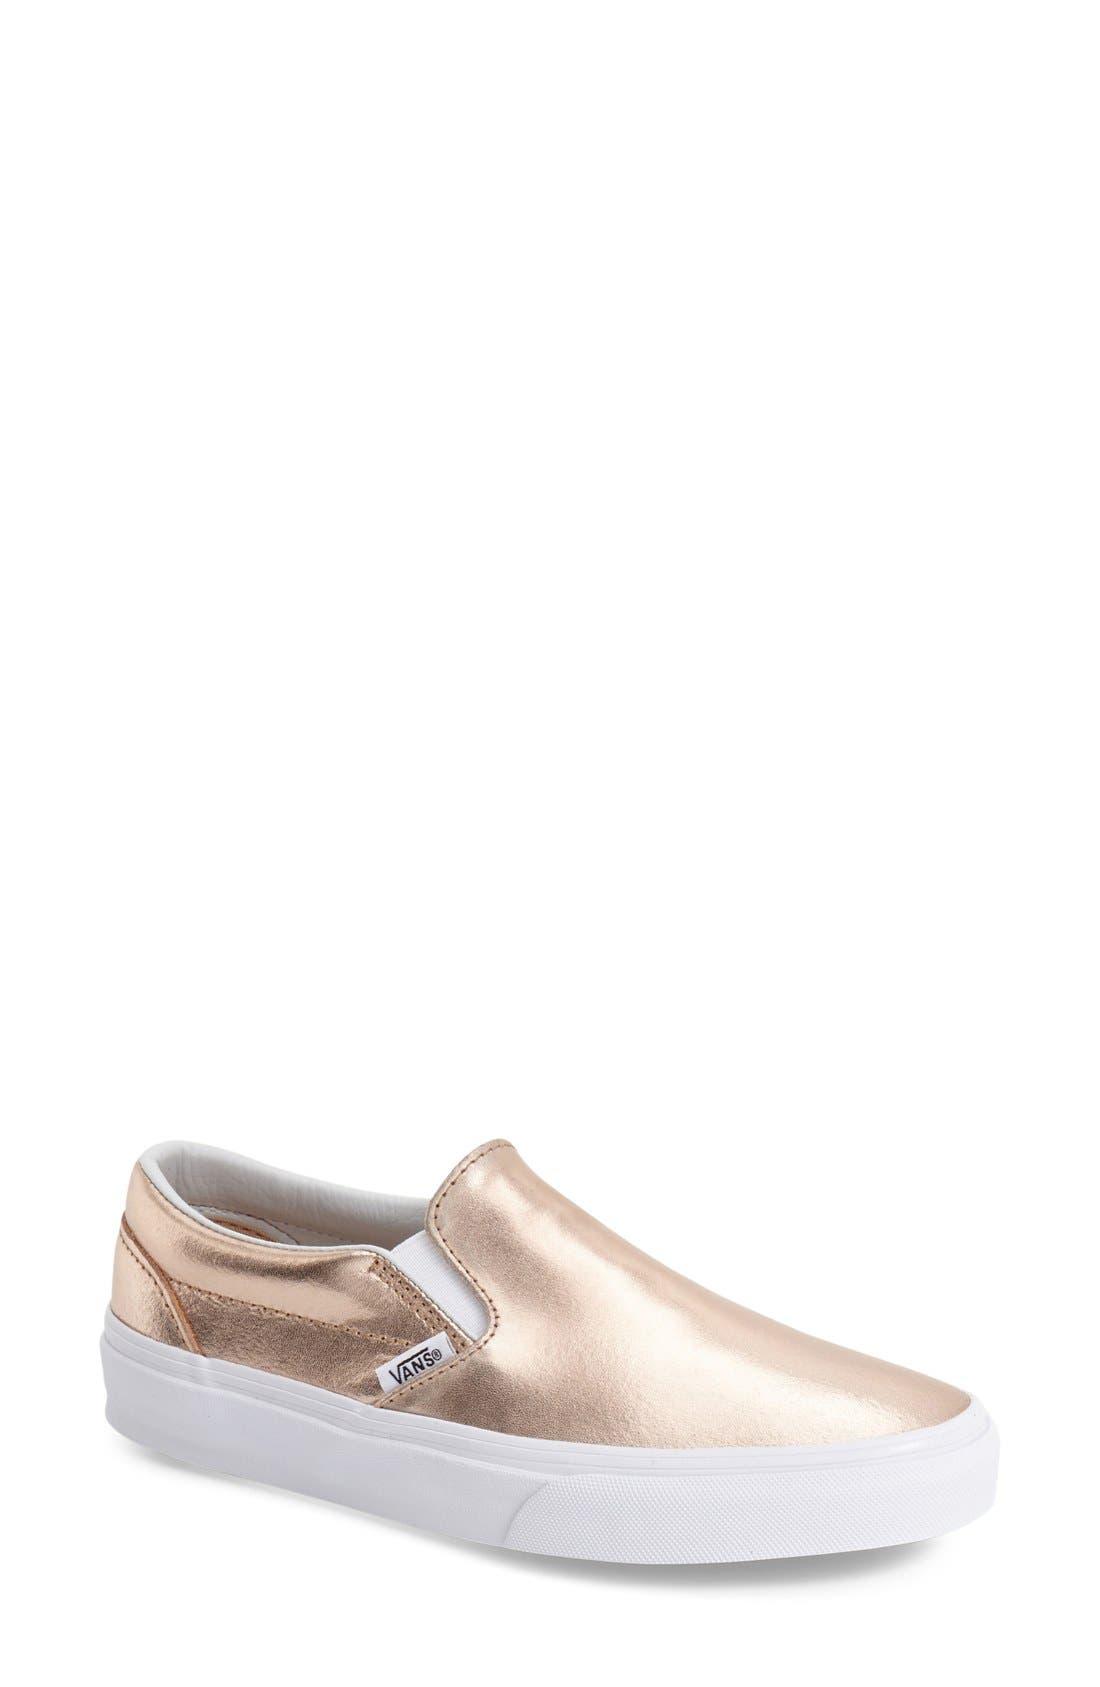 ,                             Classic Slip-On Sneaker,                             Main thumbnail 388, color,                             651